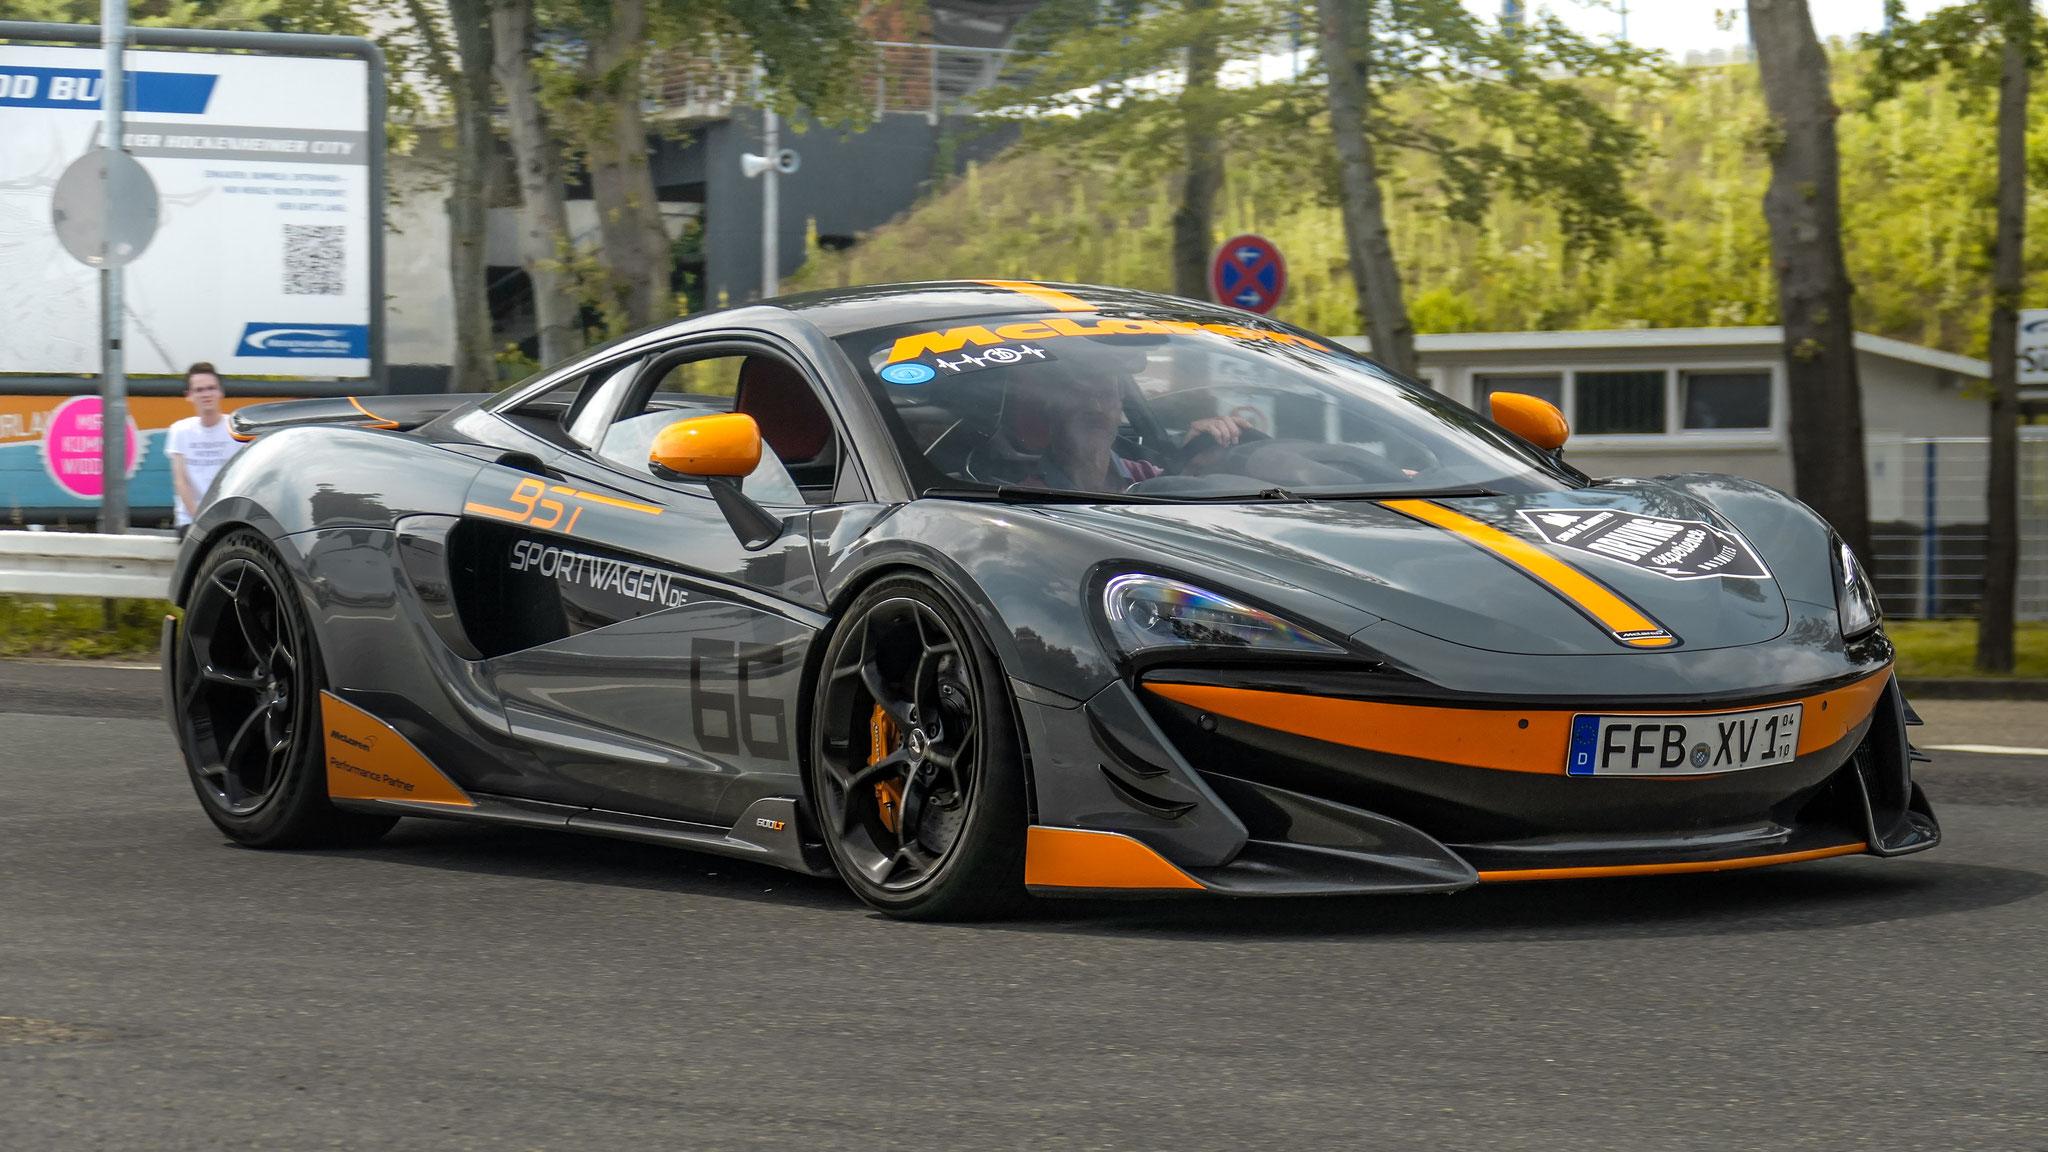 McLaren 600LT - FFB-XV-1